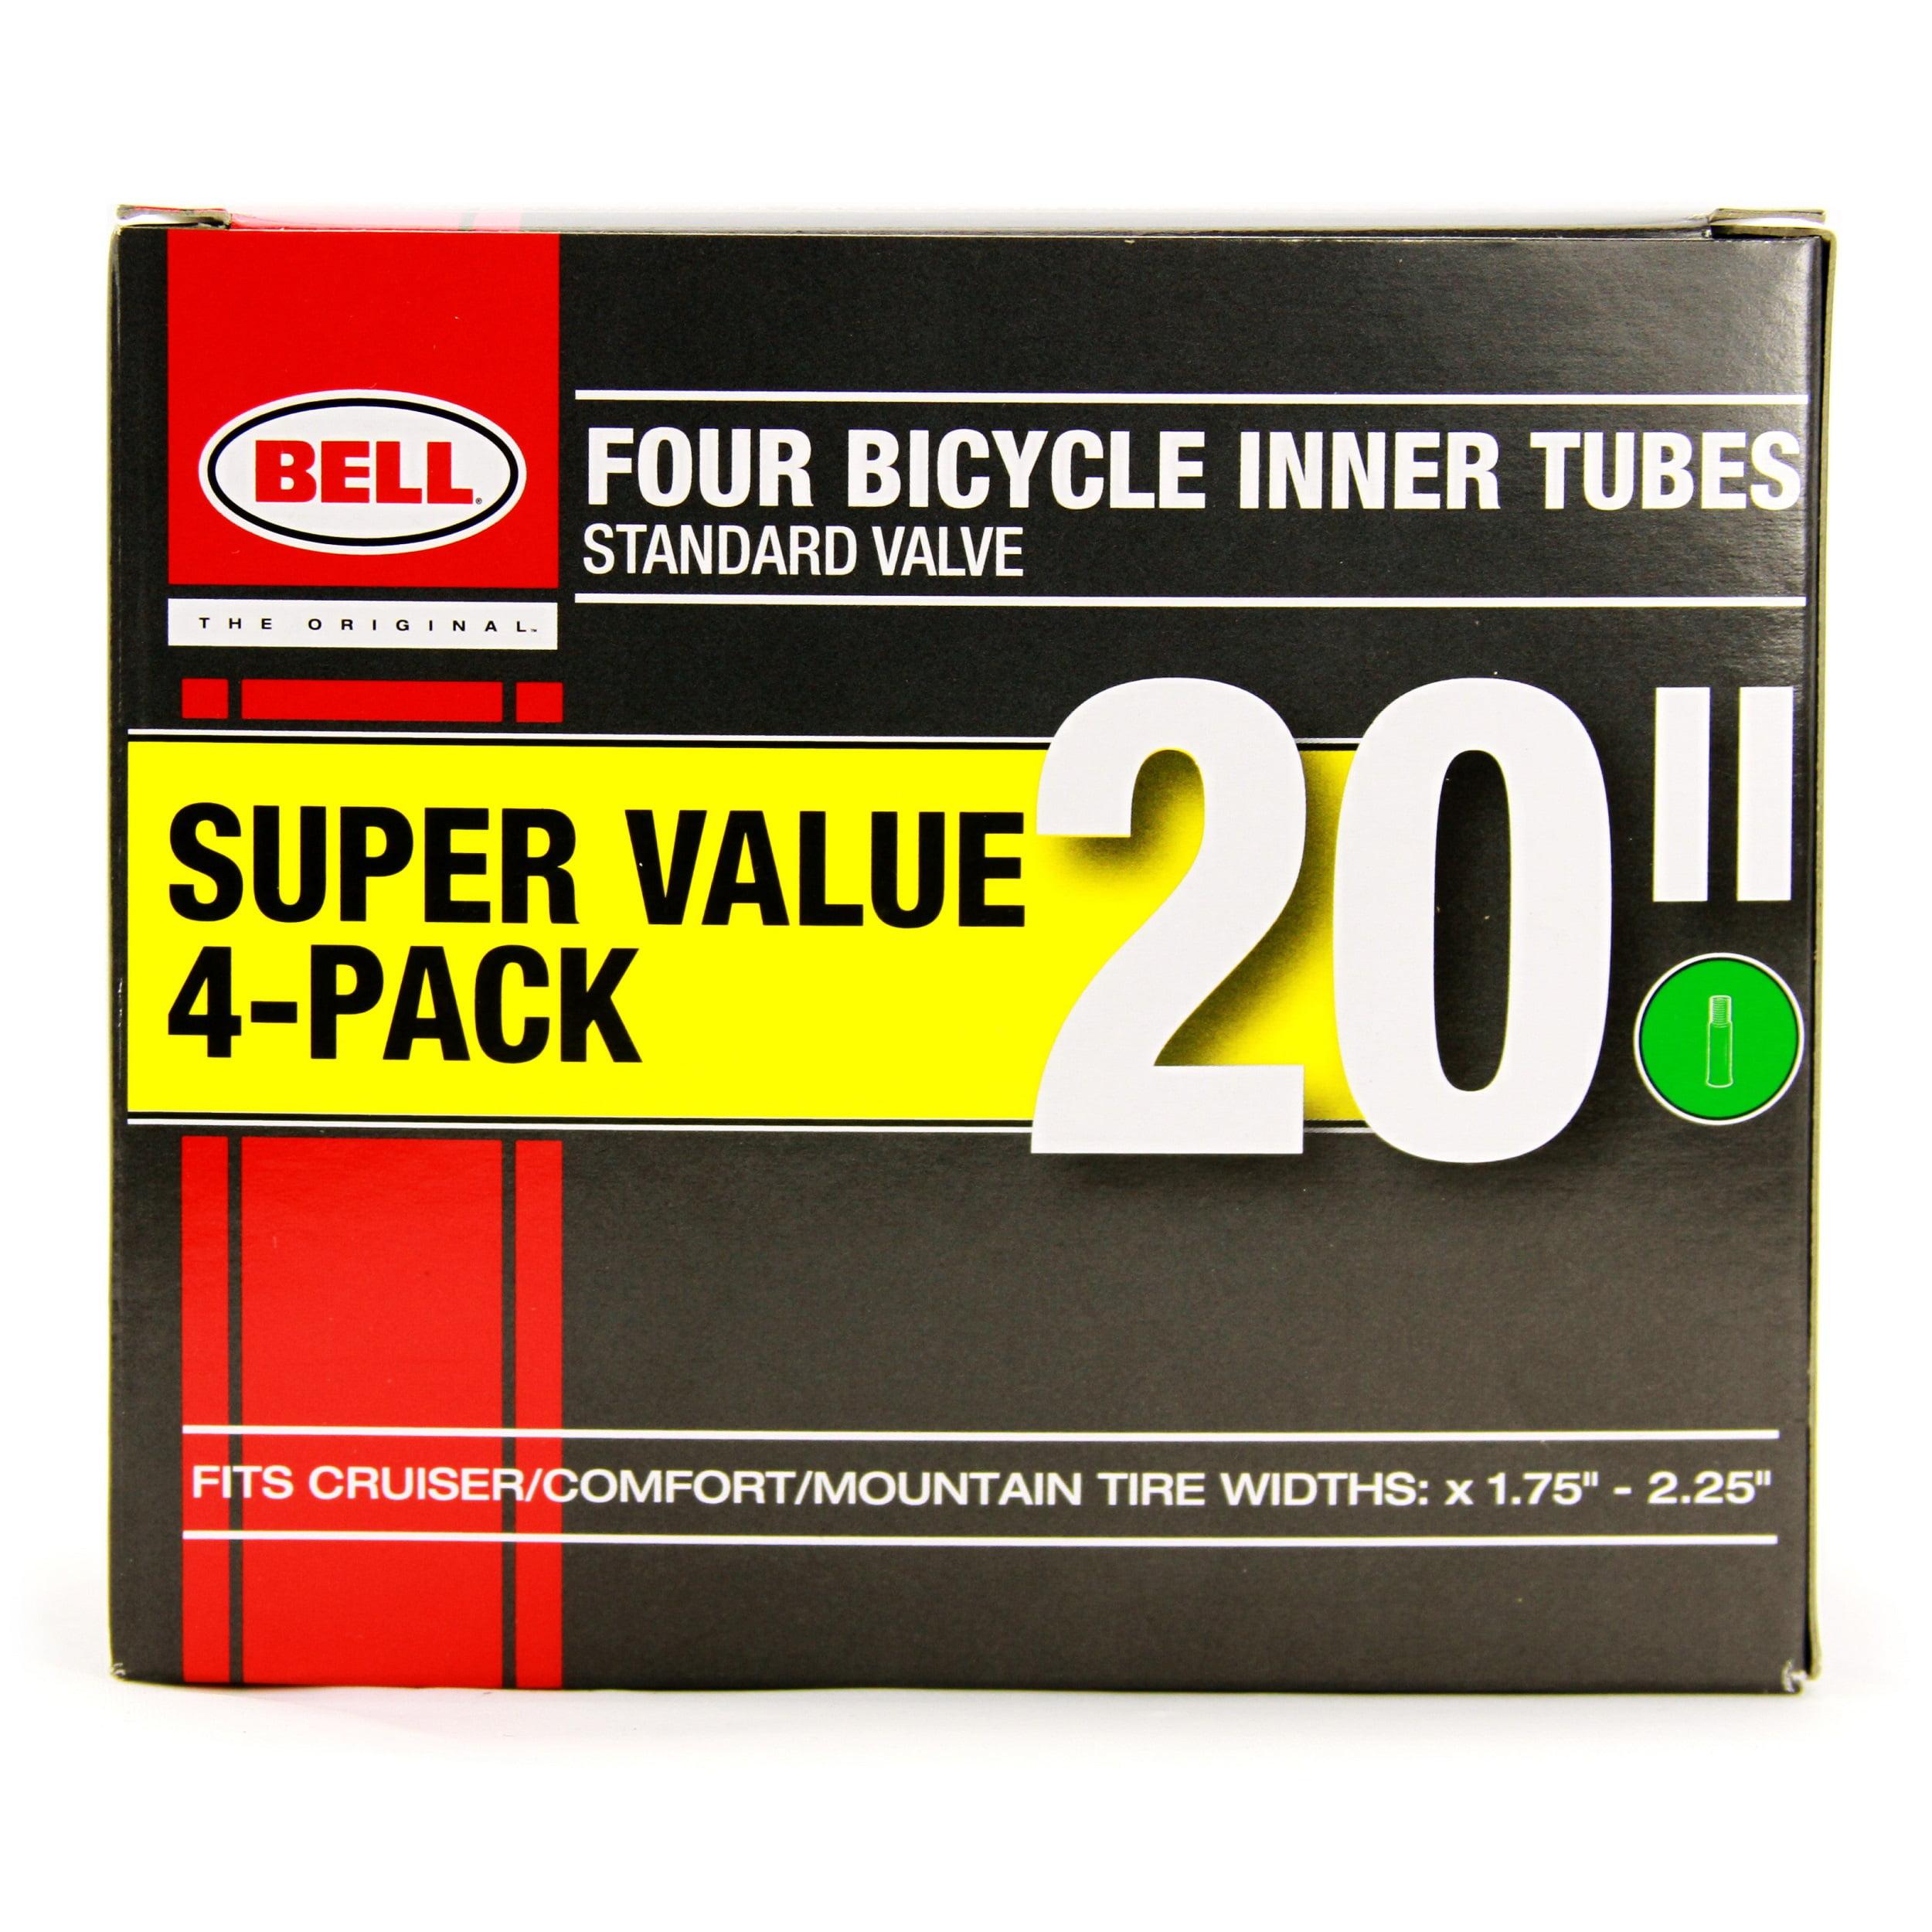 "Usa Seller Bell Universal Inner Tube 26/"" X 1.75 2.25/"" High Quality Bell Sports"